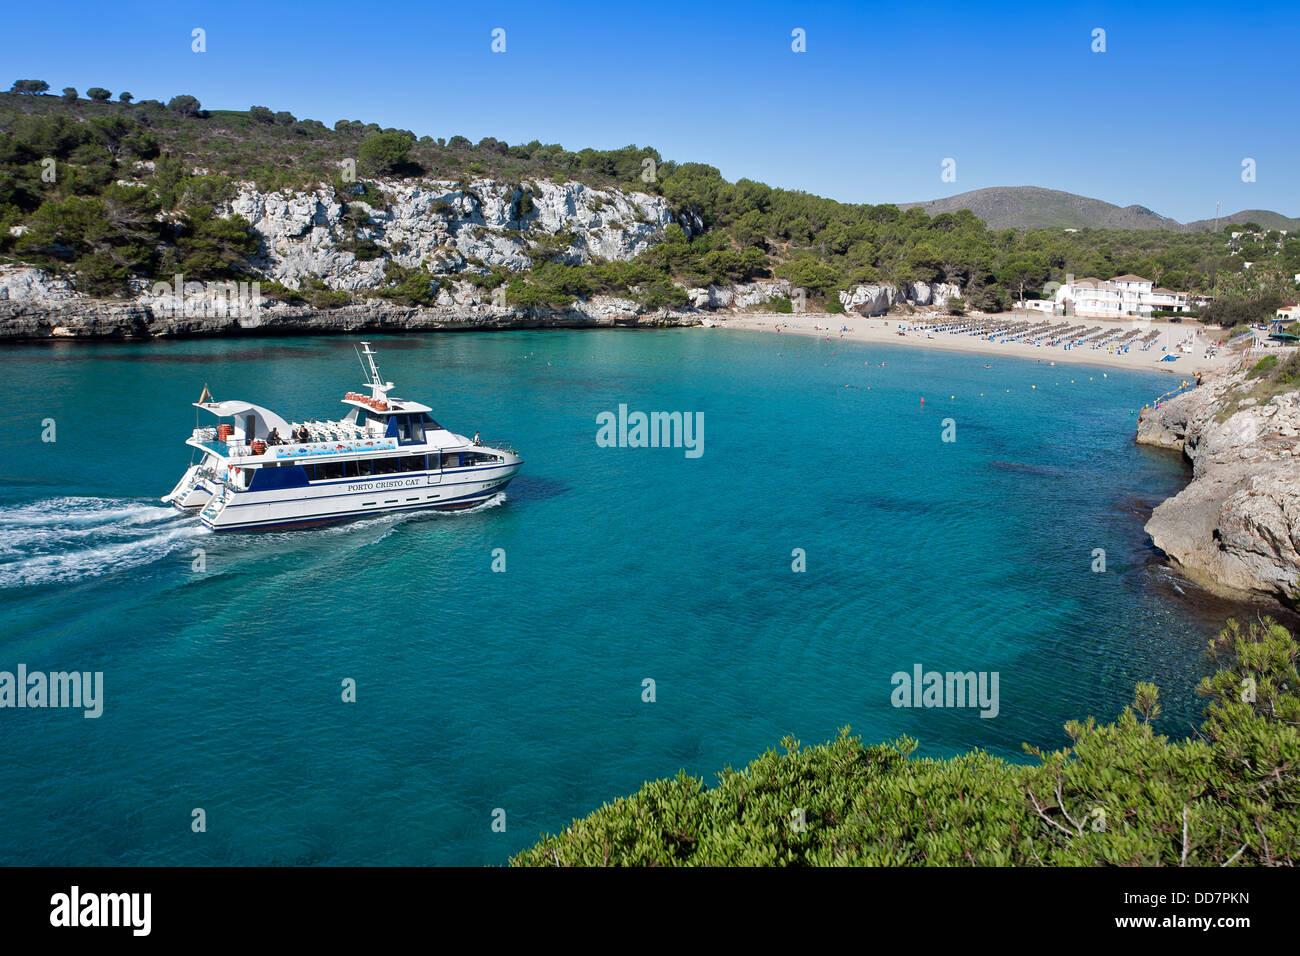 Majorca Island Tour